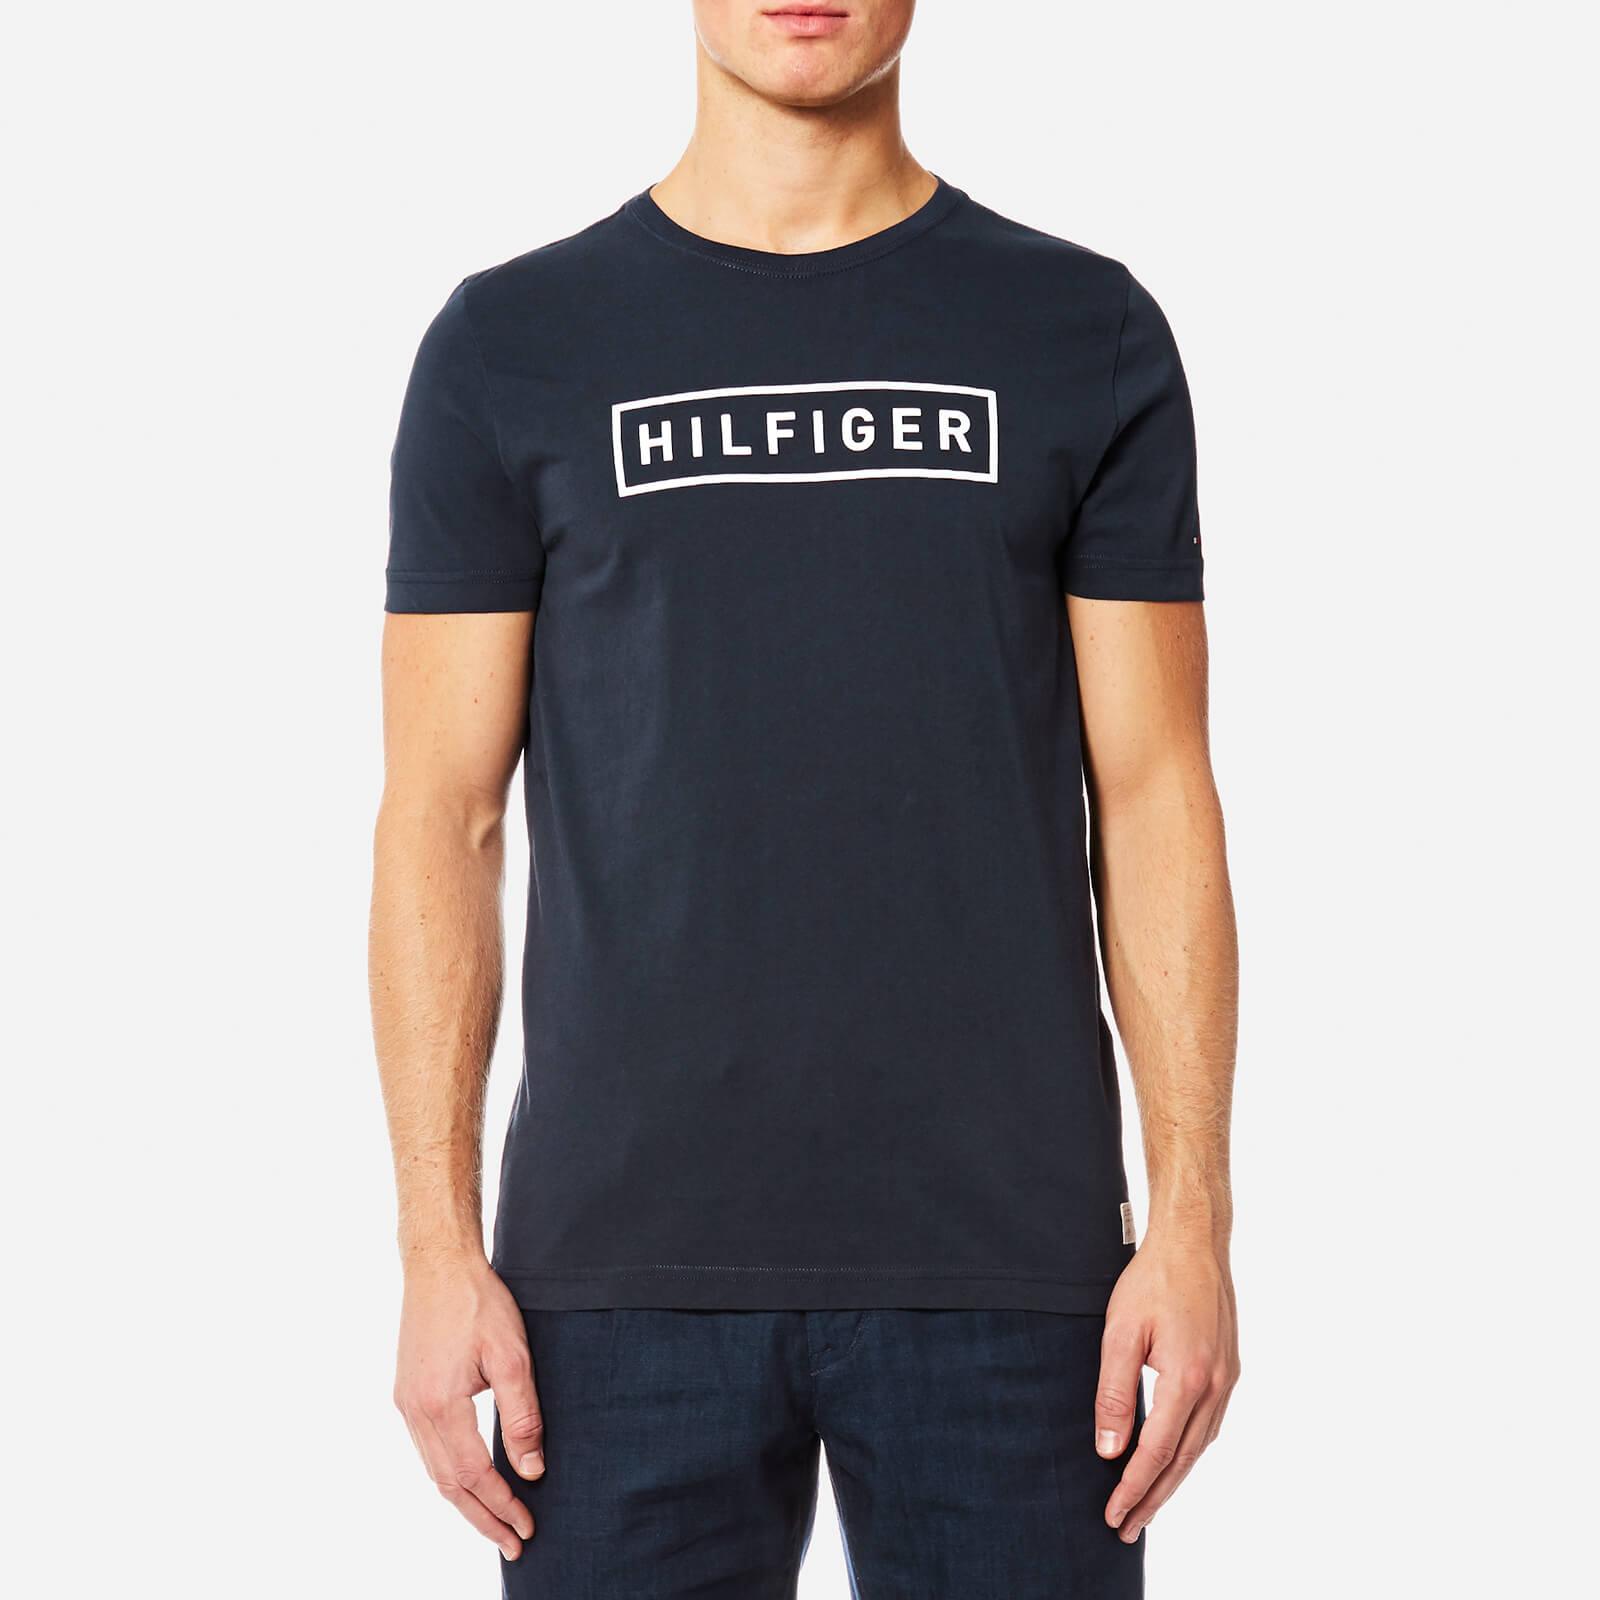 6a01c75a Tommy Hilfiger Men's Axel Crew Neck Short Sleeve T-Shirt - Sky Captain  Clothing | TheHut.com